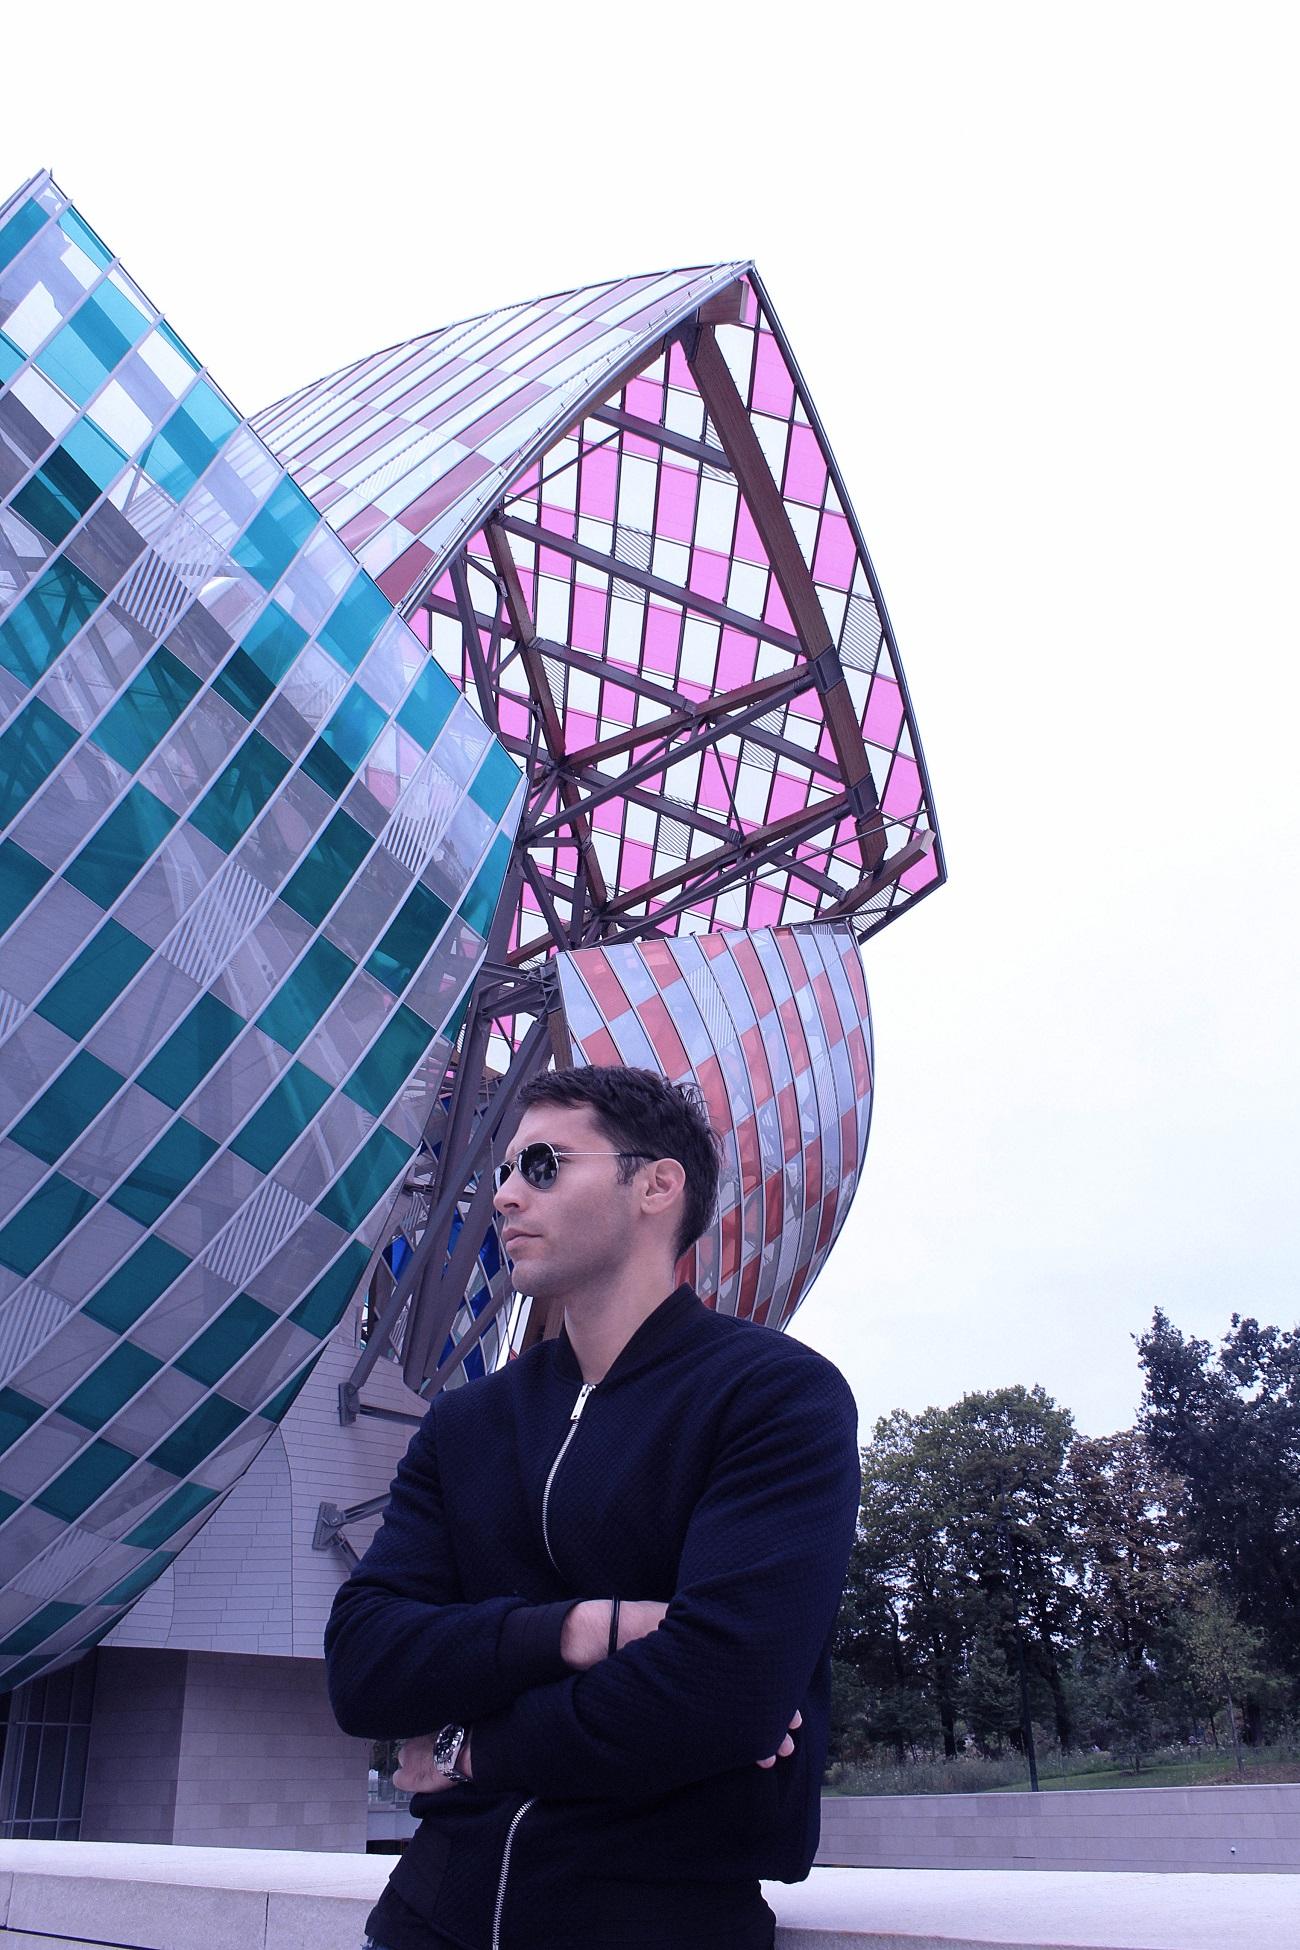 Vukota Brajovic at Louis Vuitton Fondation Paris